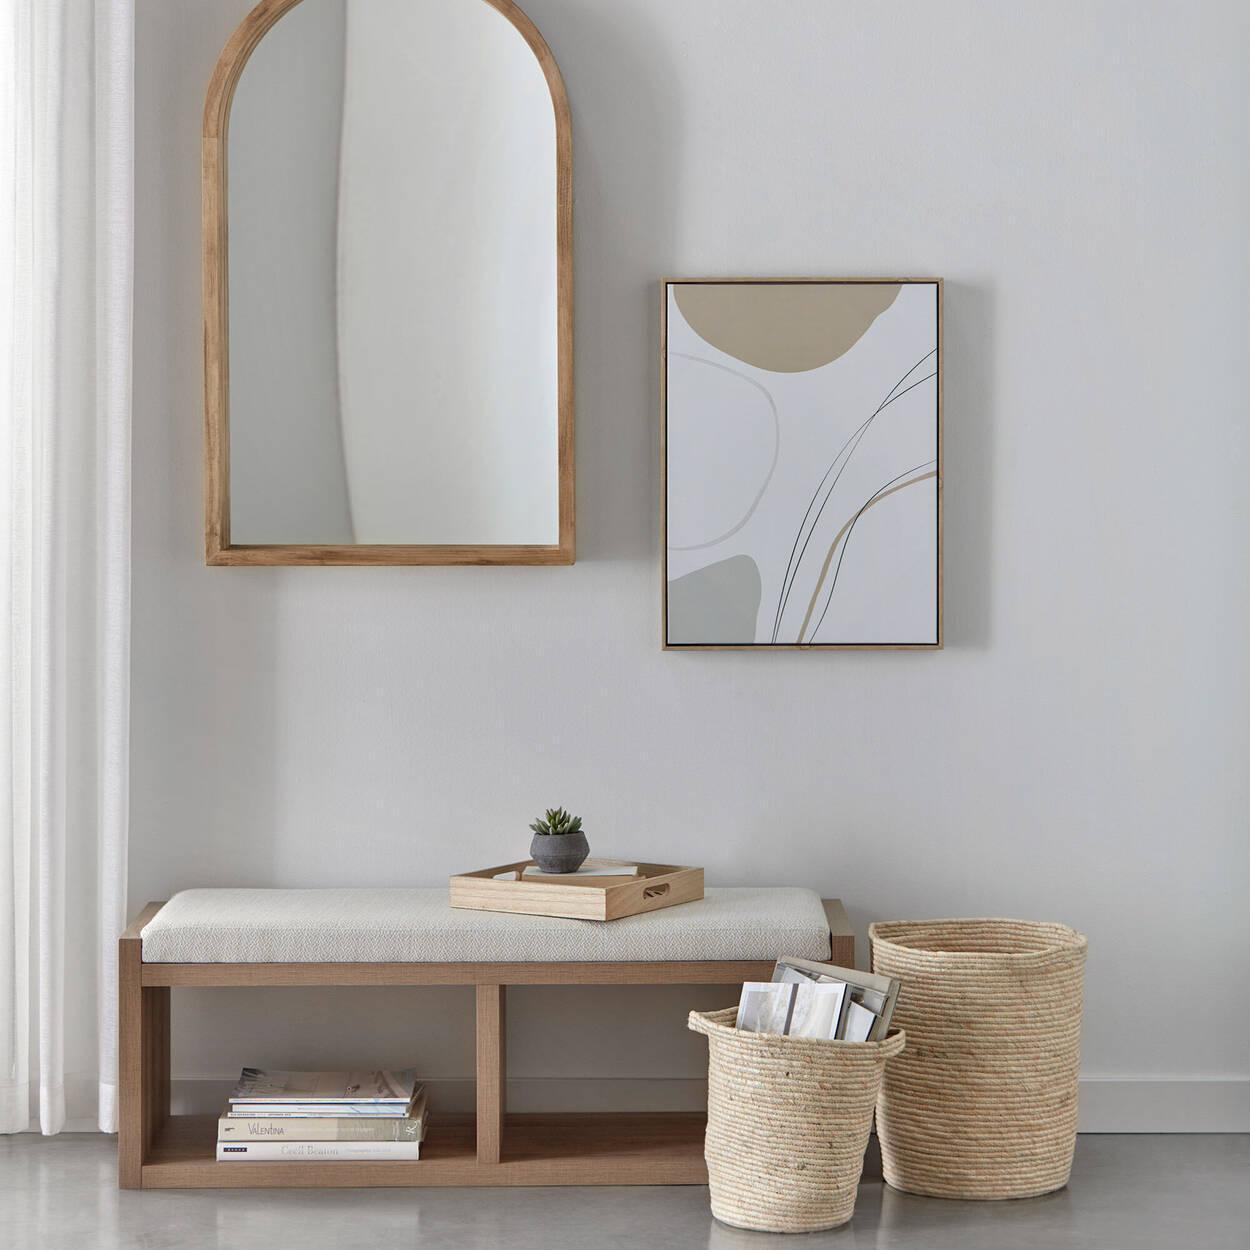 Abstract Linear Framed Art